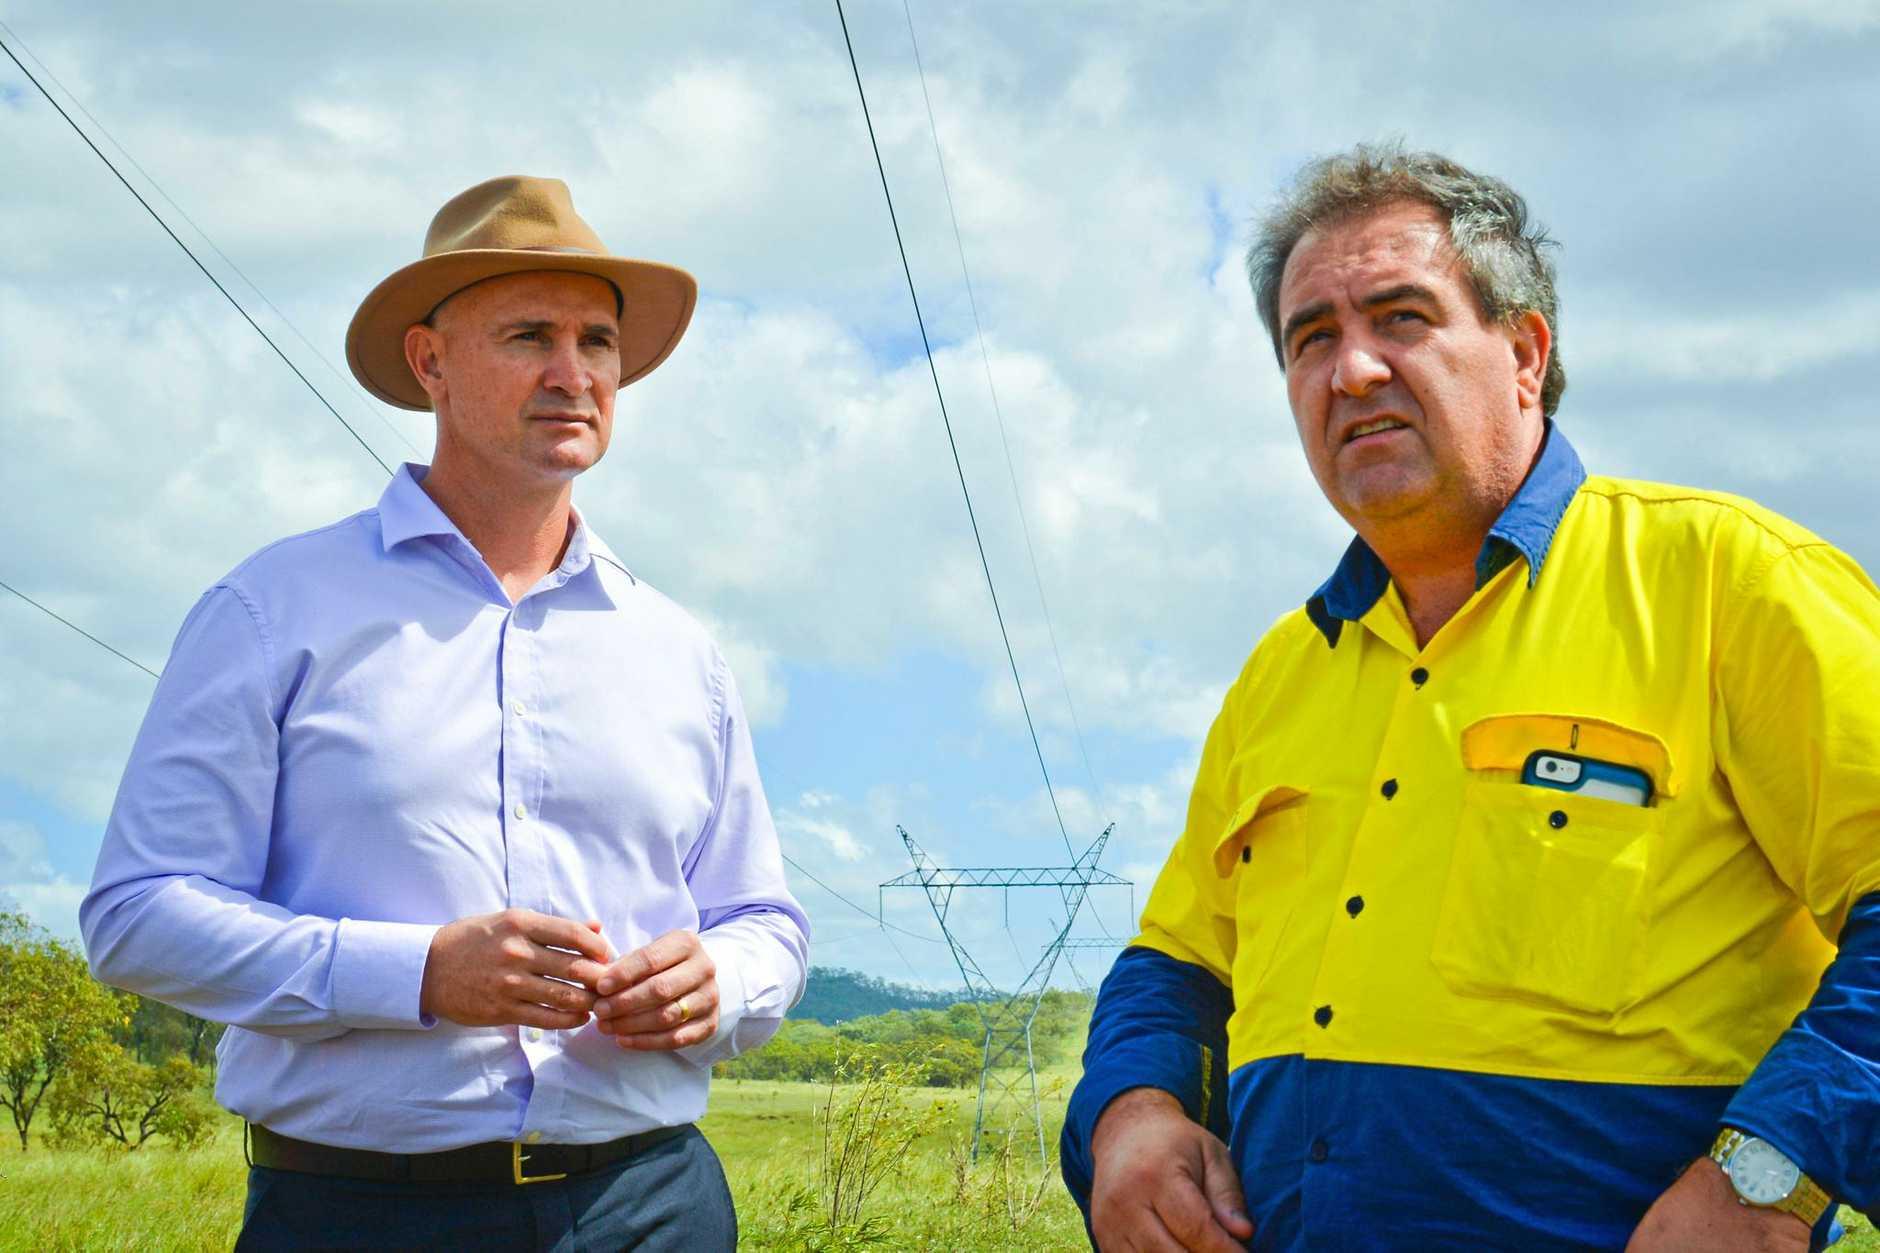 Glenn Butcher and Economic Development Queensland land planning and development manager John Brun at the Aldoga site.